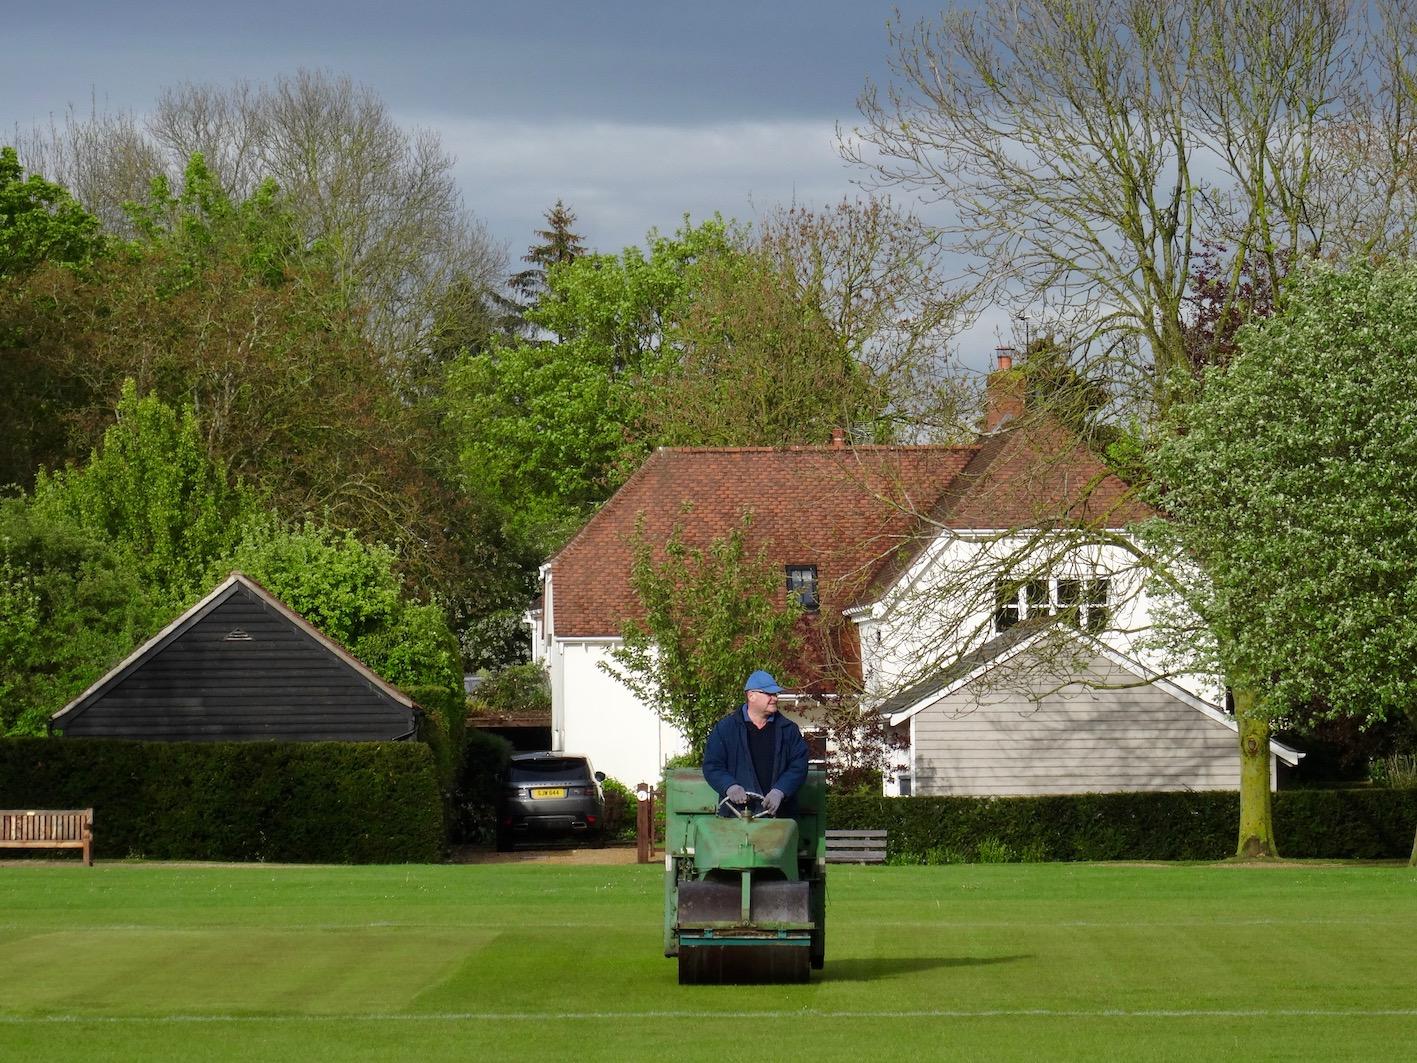 Barrington Cricket Green Cambridgeshire England.